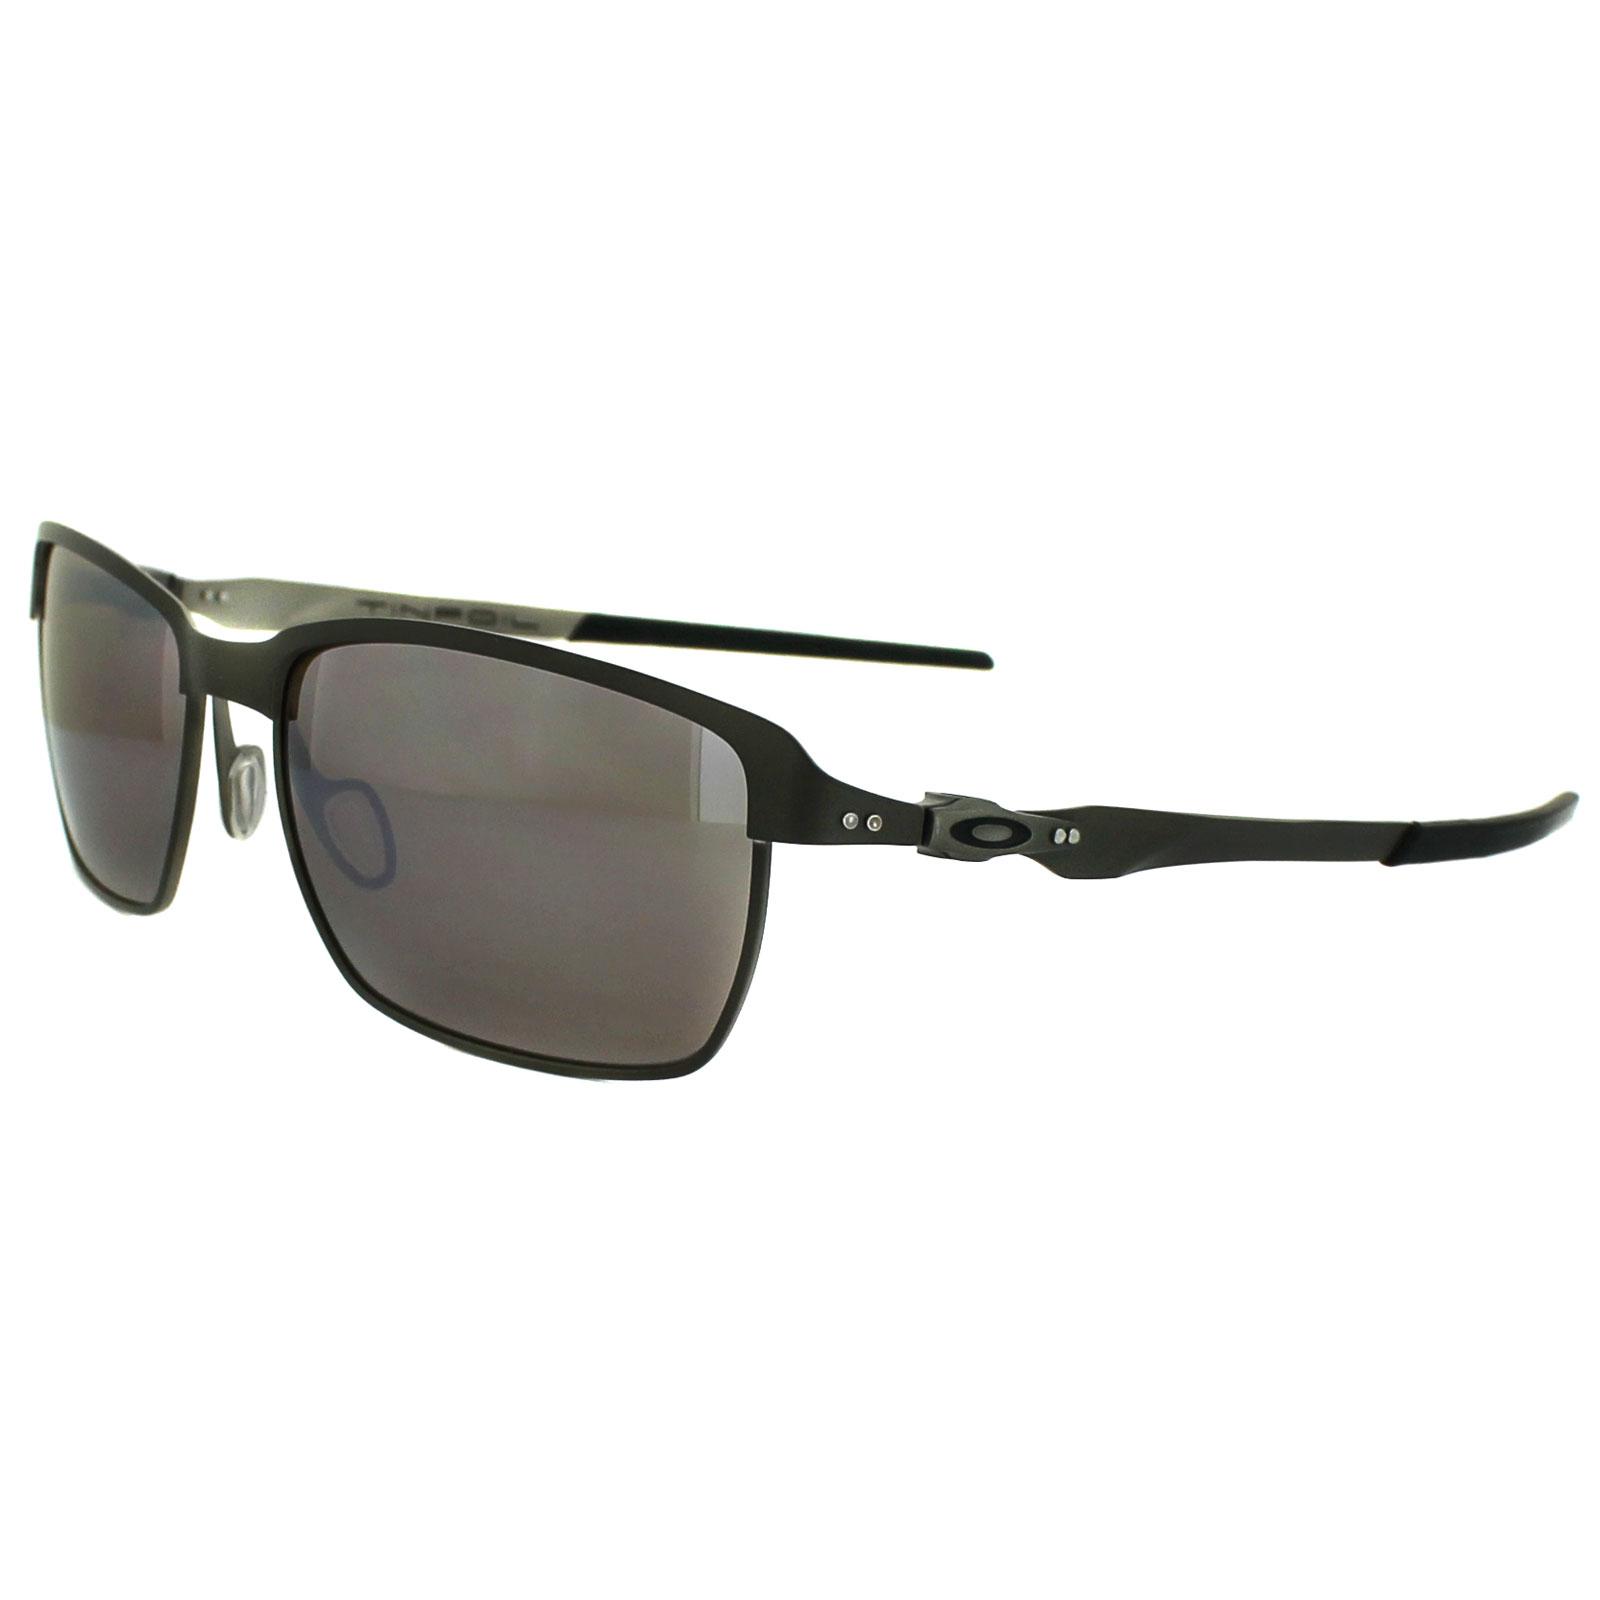 titanium eyewear 7x7p  oakley titanium eyewear